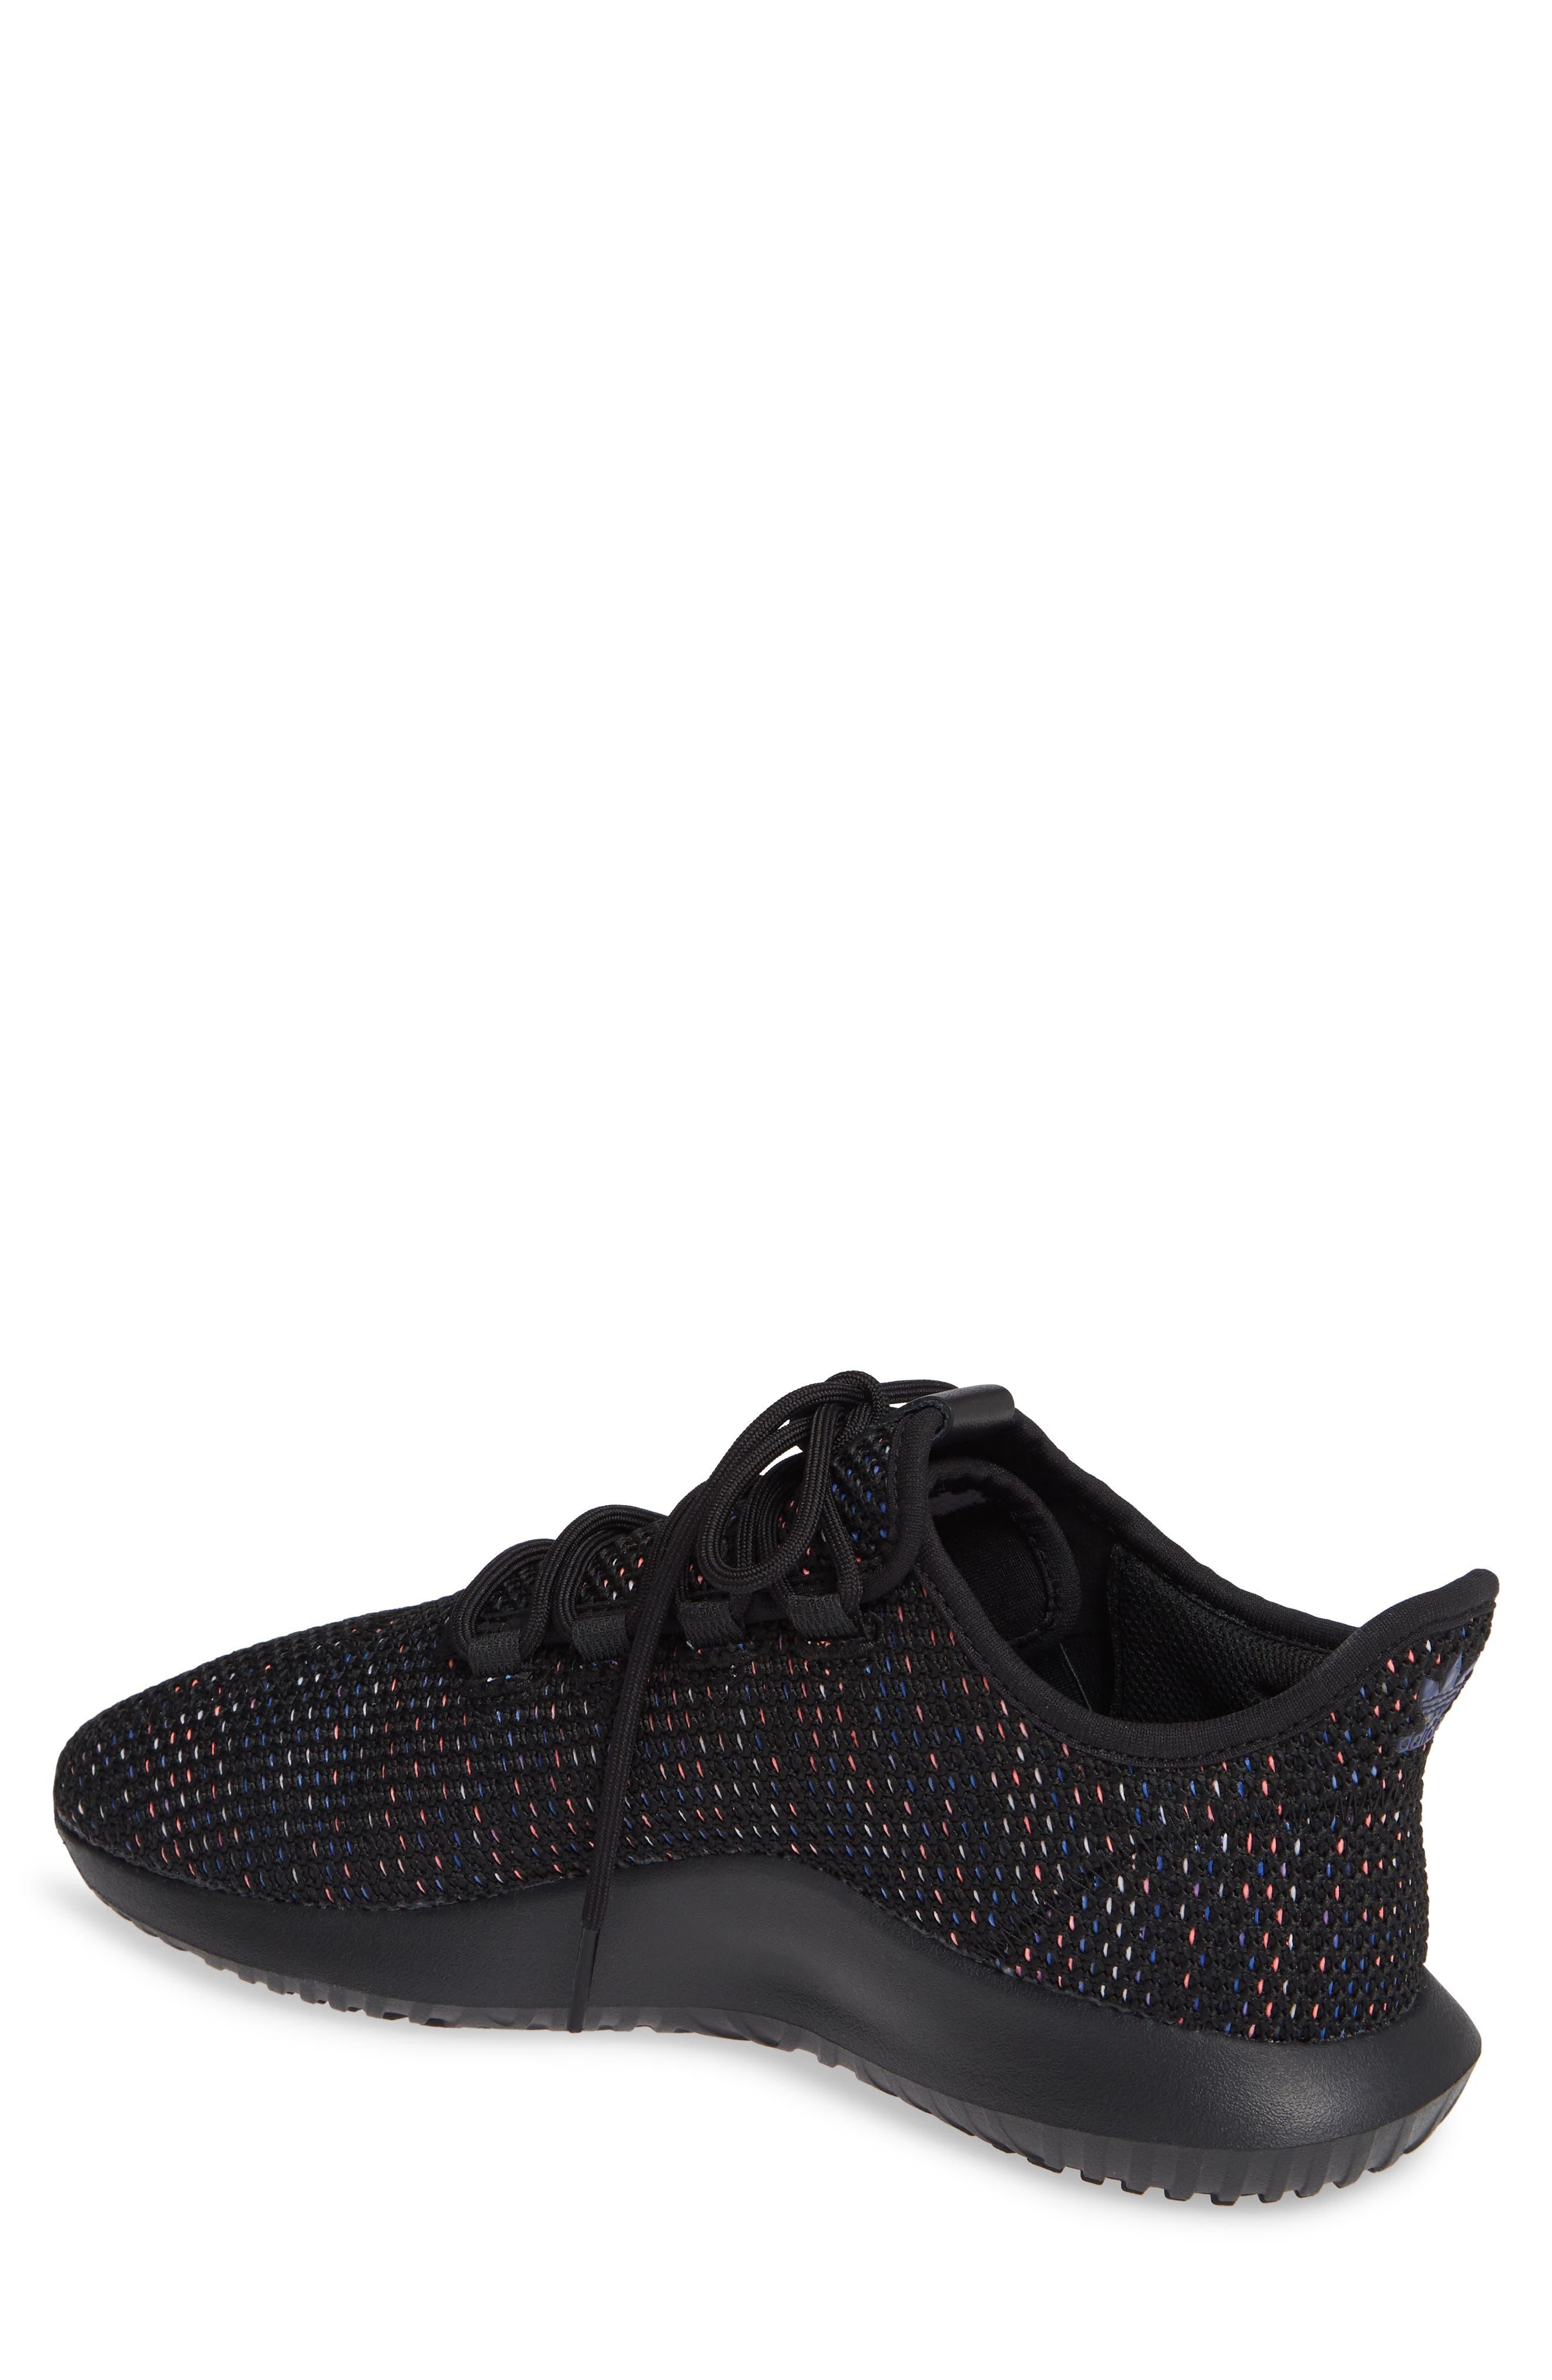 Tubular Shadow CK Sneaker,                             Alternate thumbnail 2, color,                             BLACK/ SOLAR RED/ MYSTERY INK